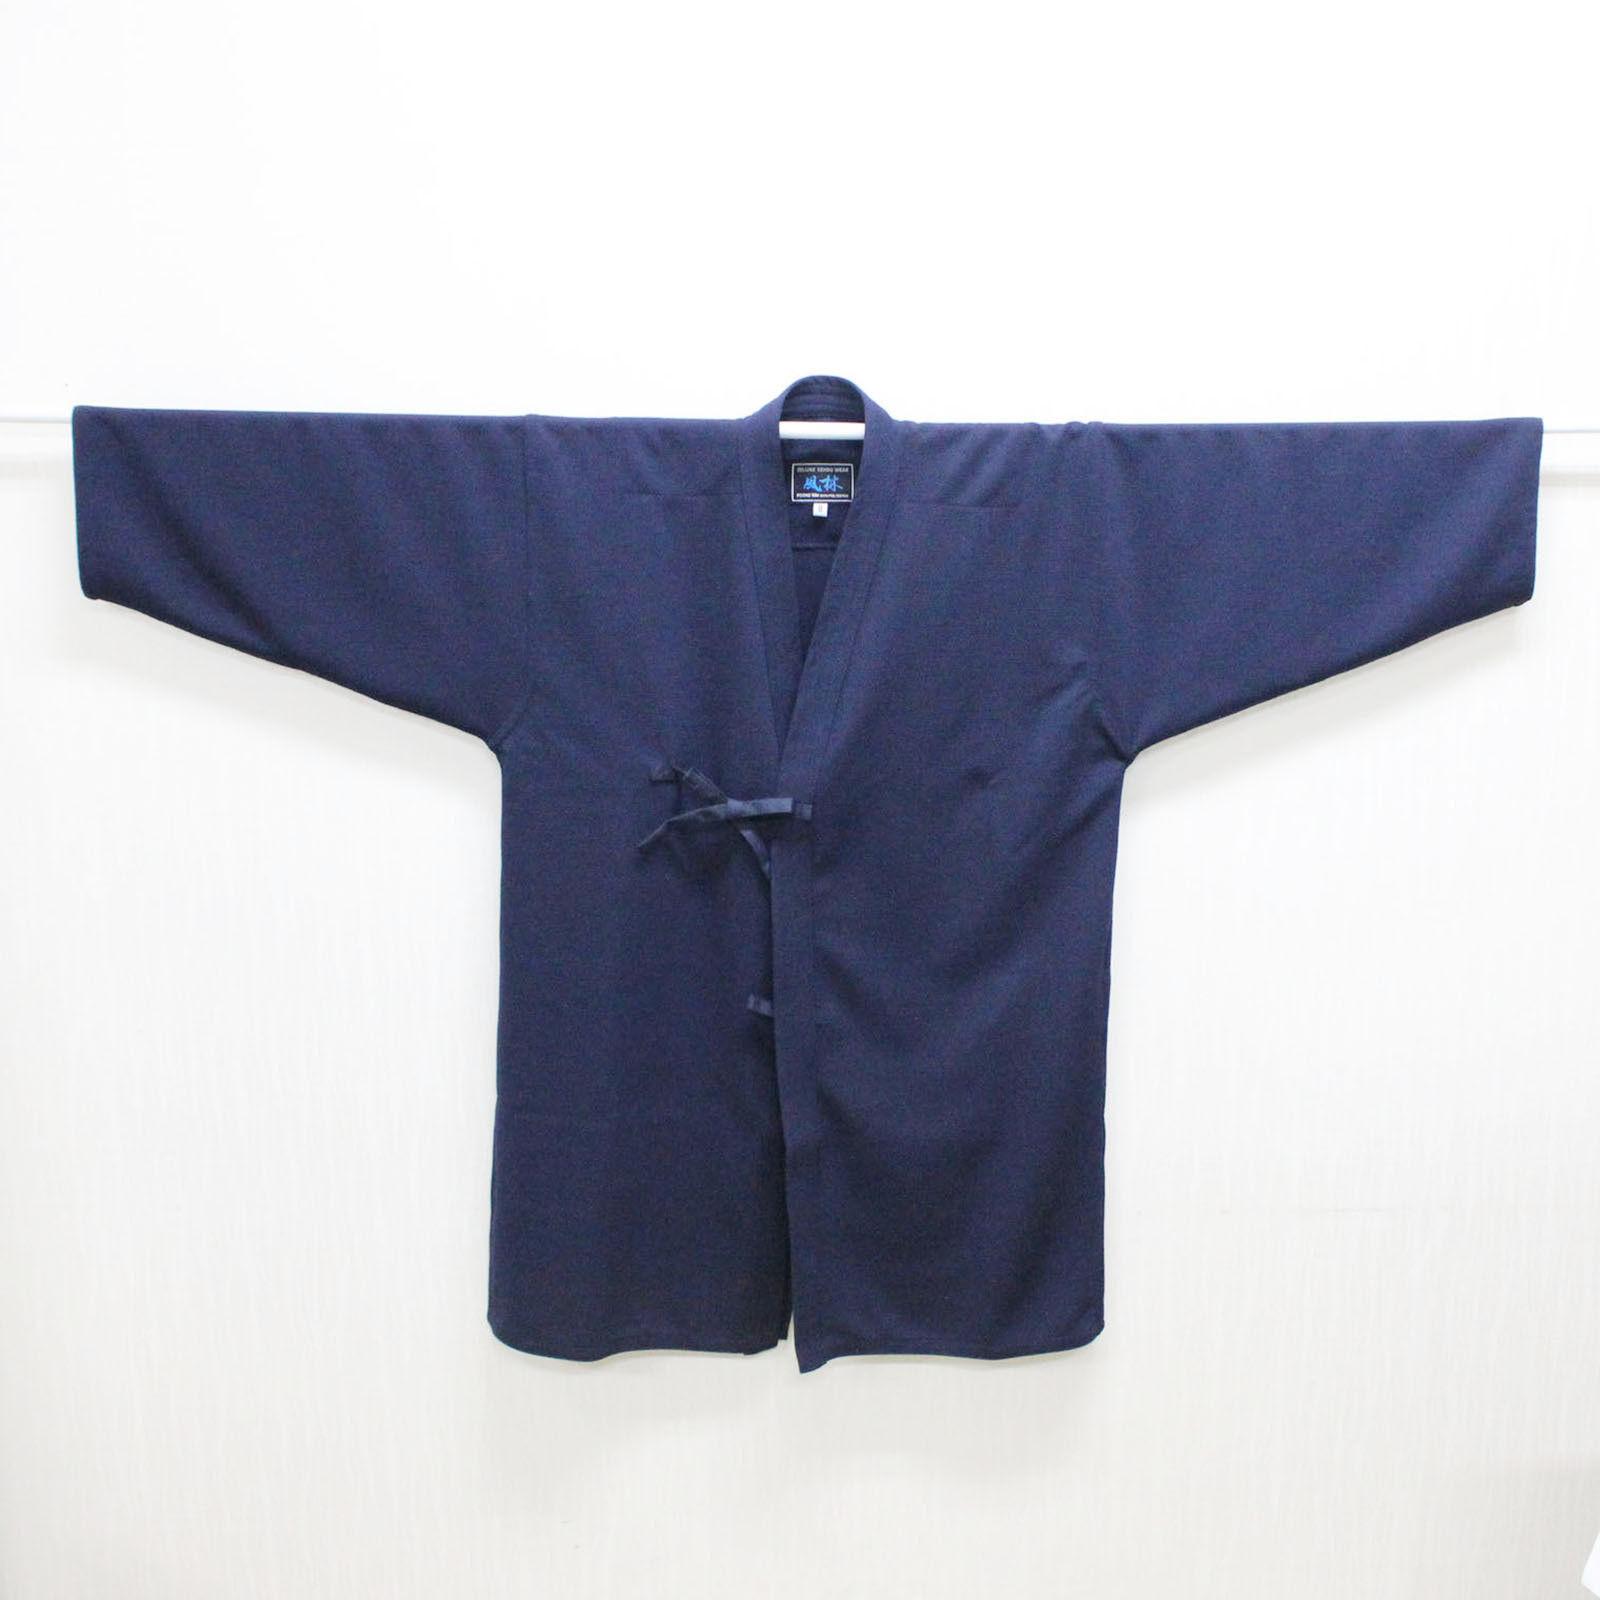 Lightweight Summer Kendogi Gi Uniform Top Polyester  Kendo Kumdo Training MMA Pro  clearance